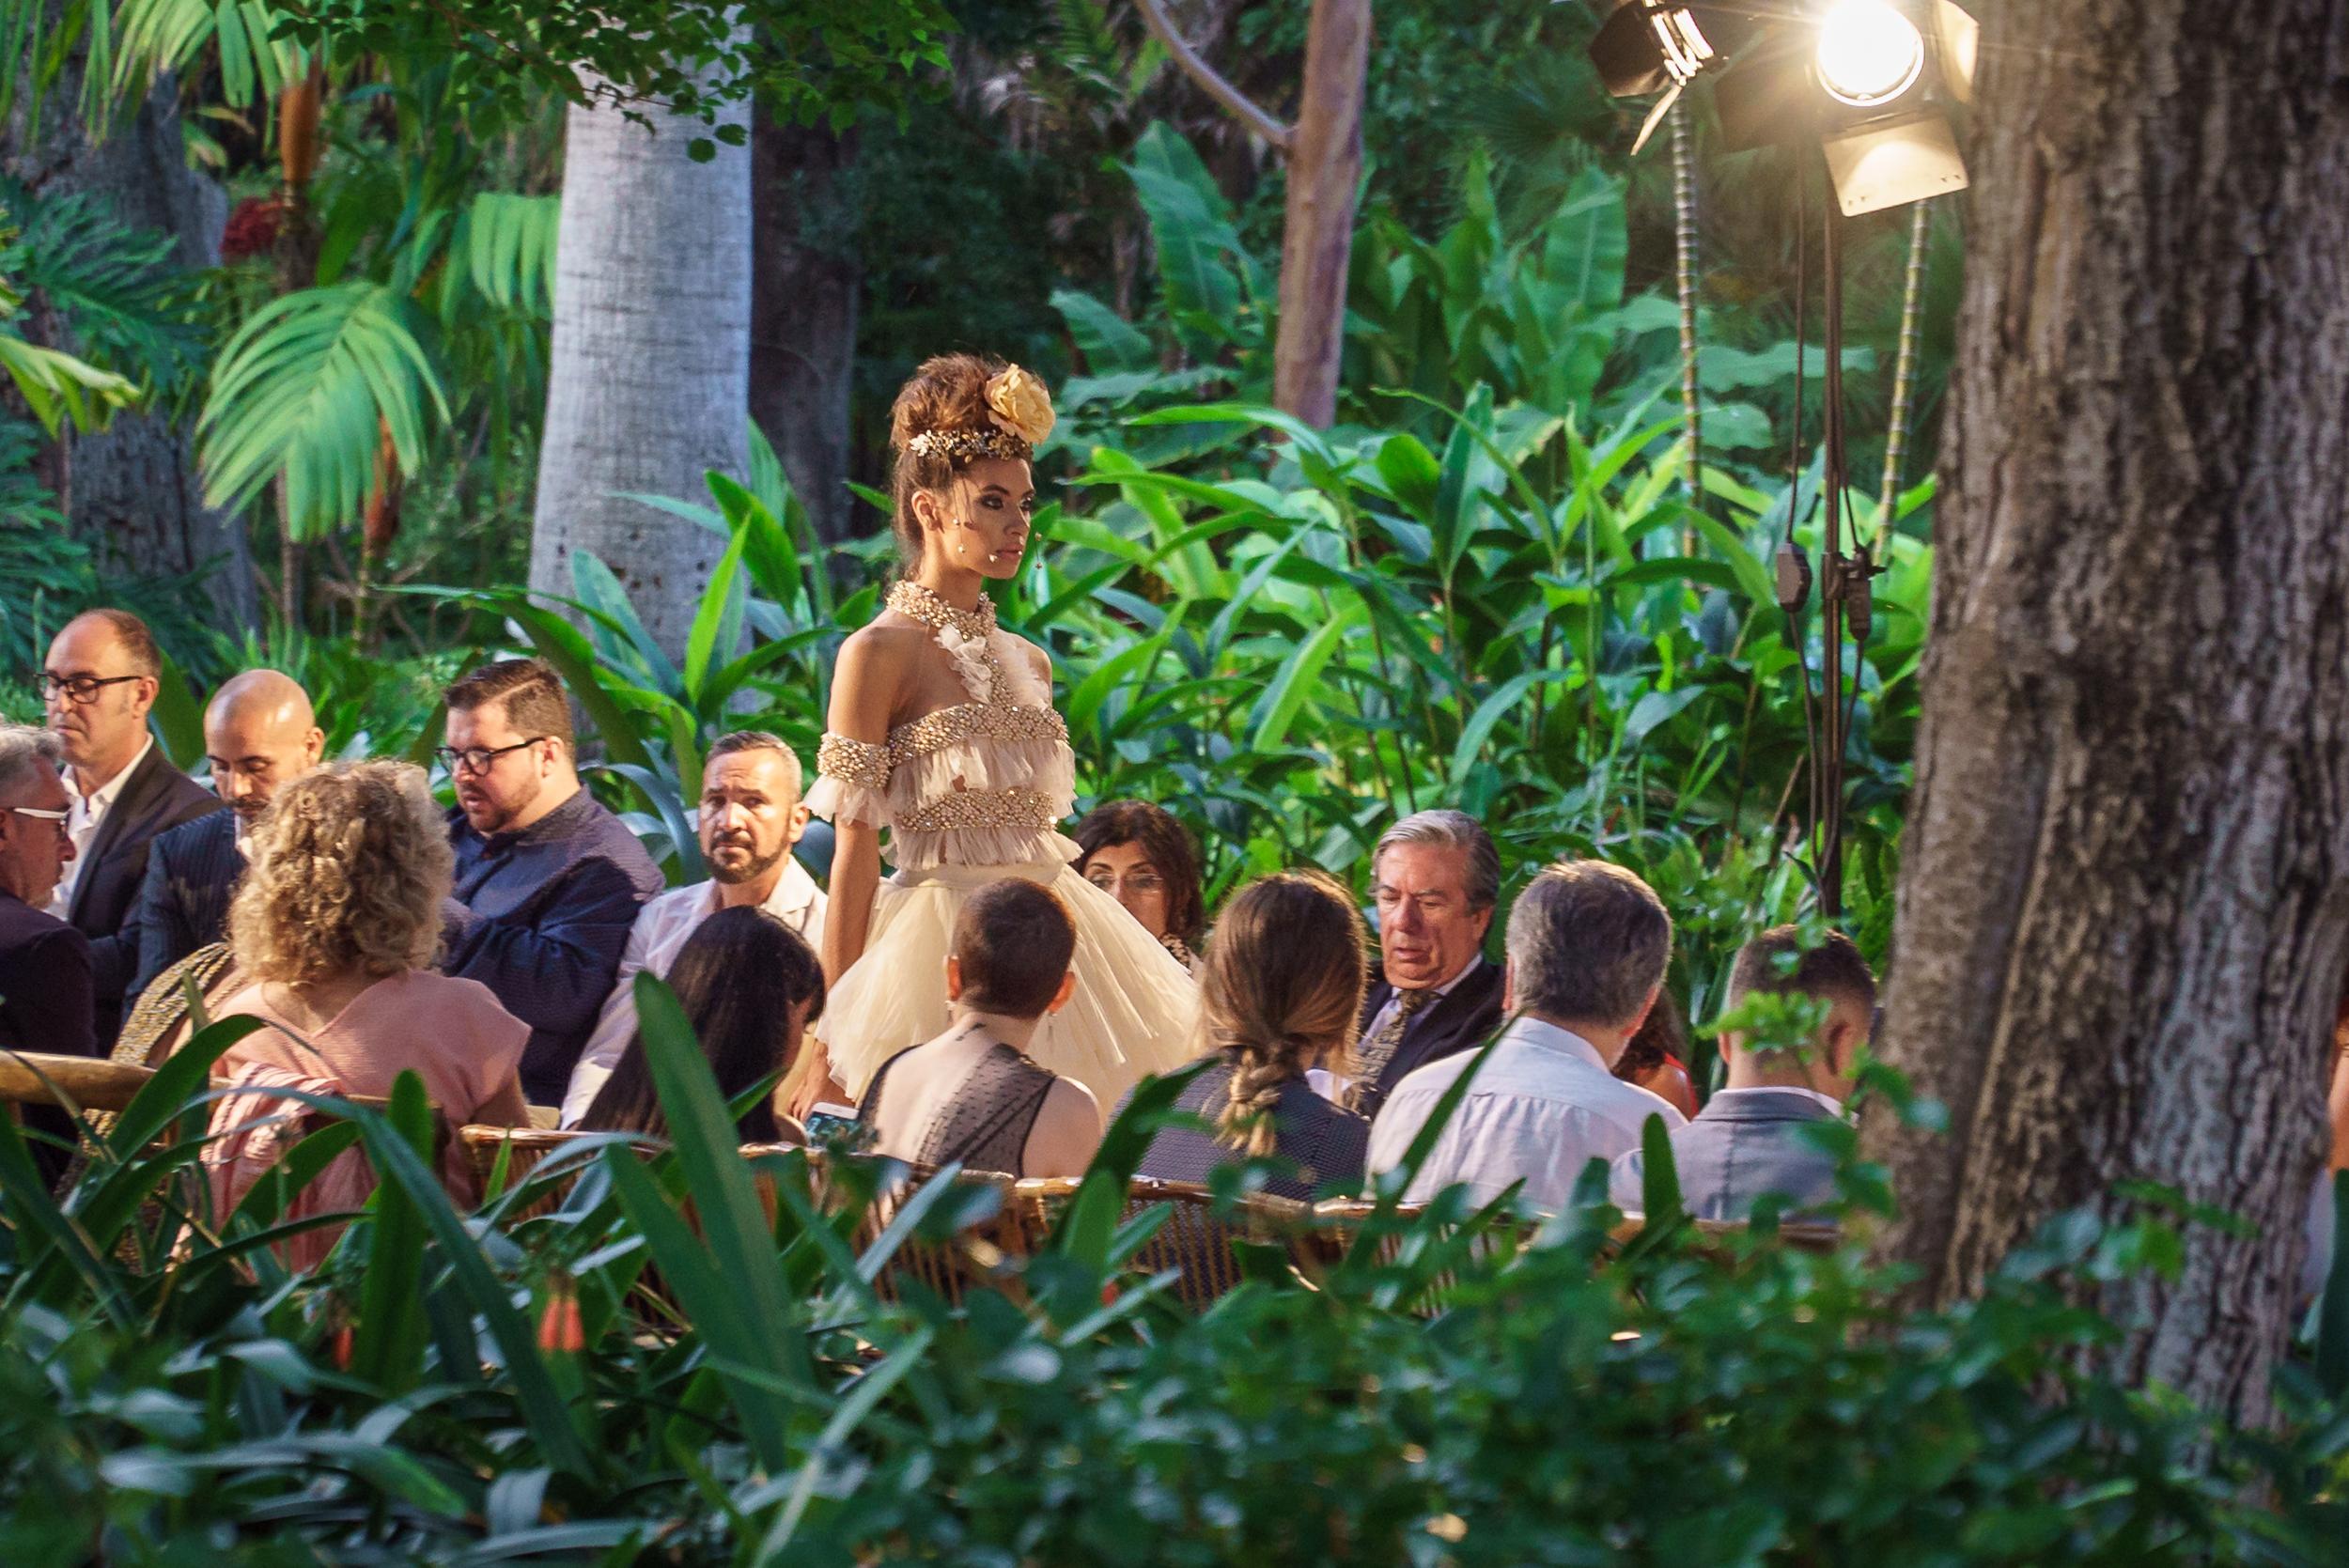 M&M transforma el Botánico en pasarela de alta costura